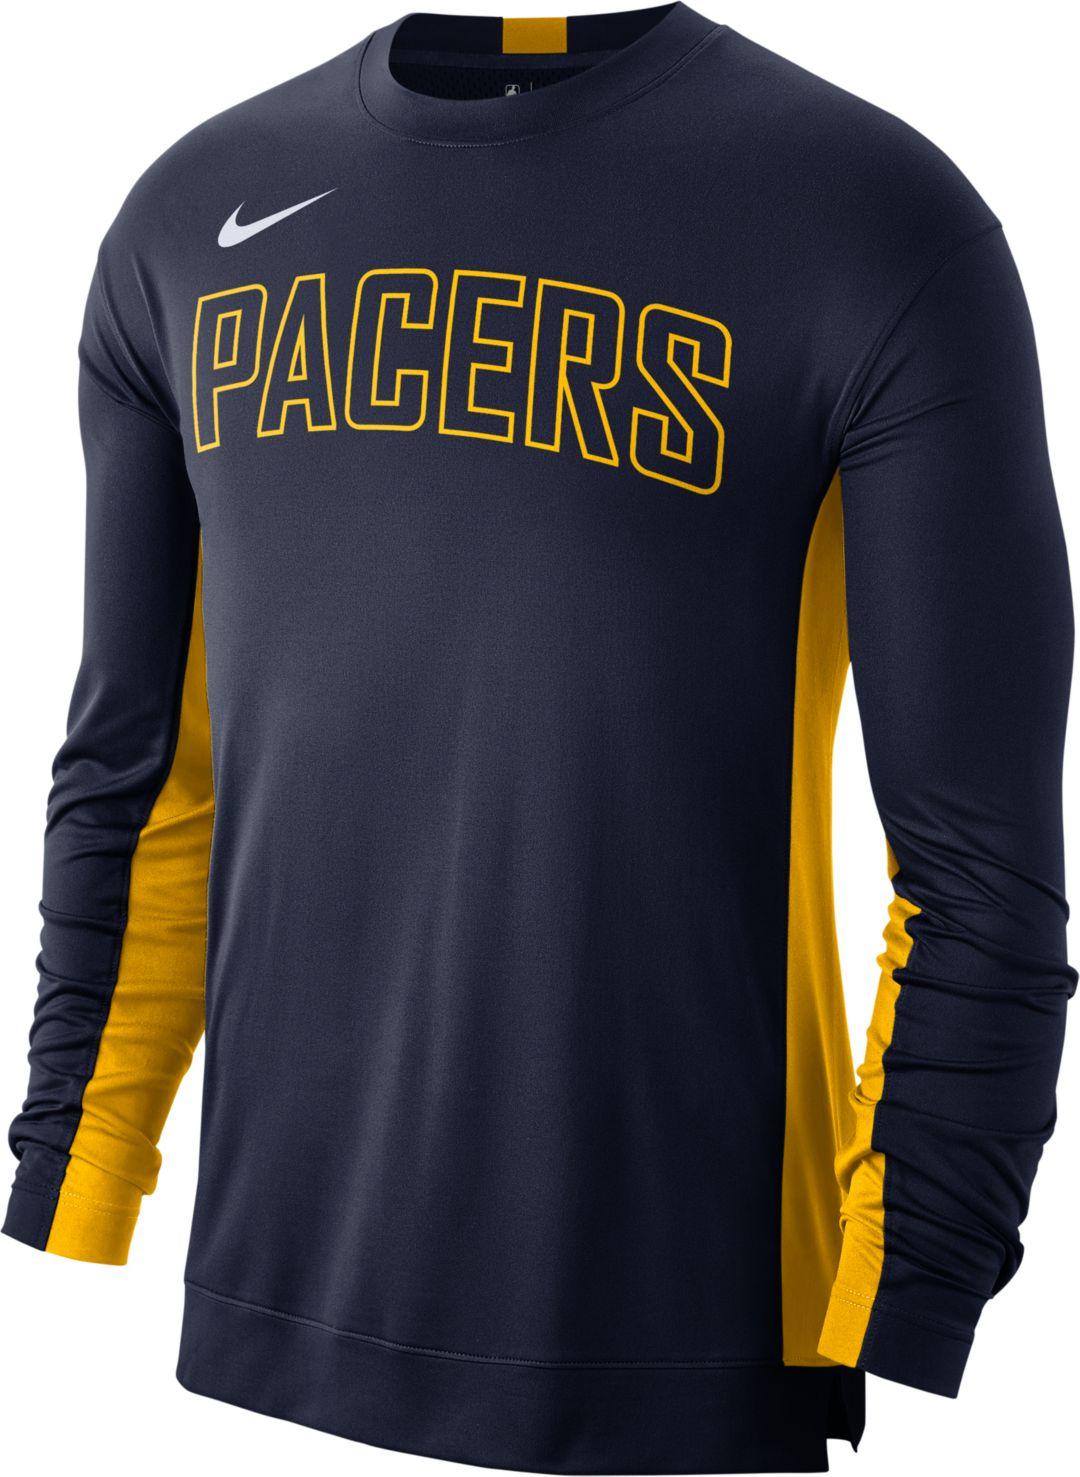 sale retailer 96a5f fdd0e Nike Men's Indiana Pacers Dri-FIT Long Sleeve Shooting Shirt